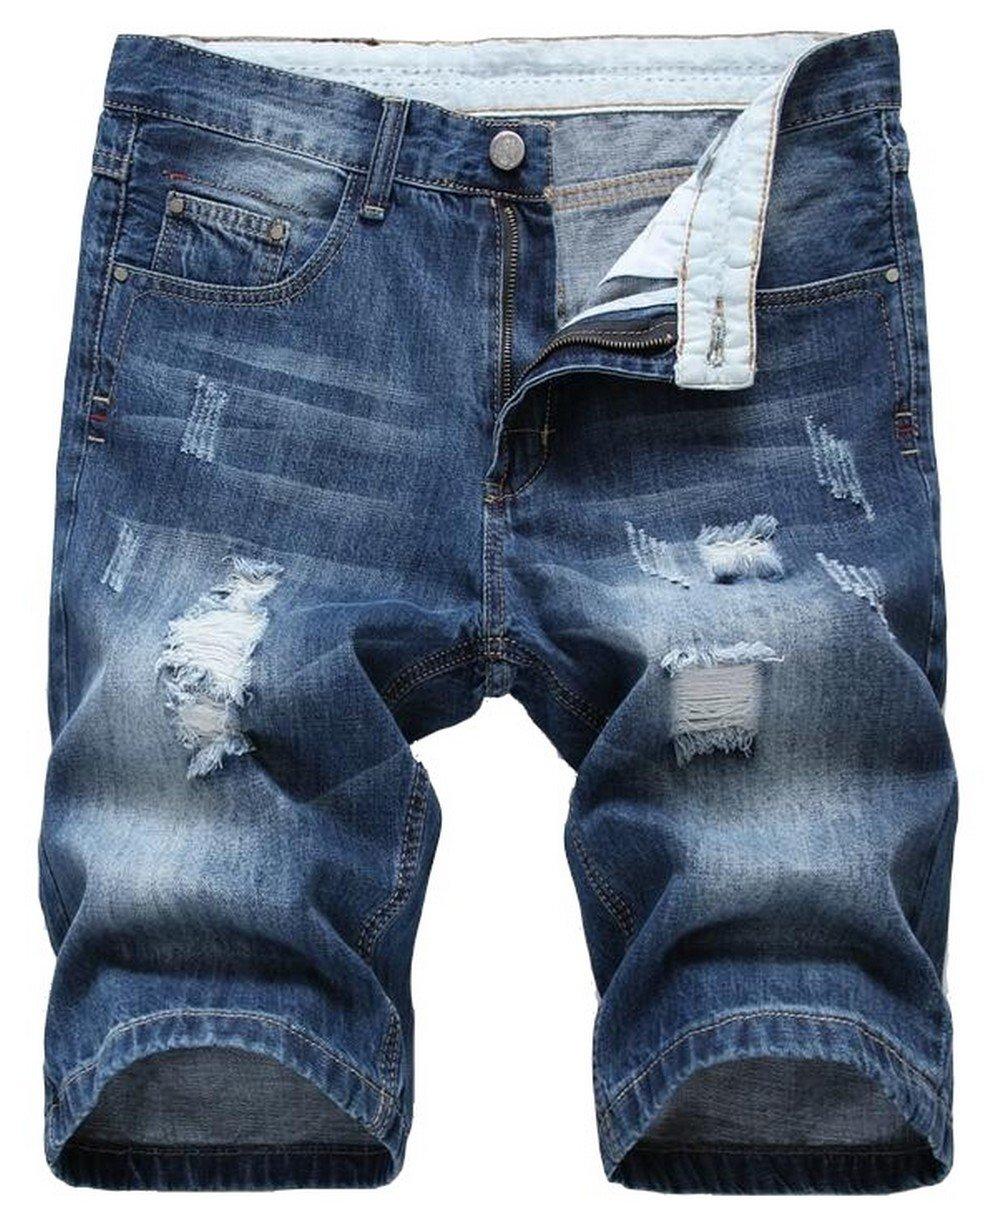 Jinmen Men's Regular Fit Ripped Distressed Straight Denim Short with Hole